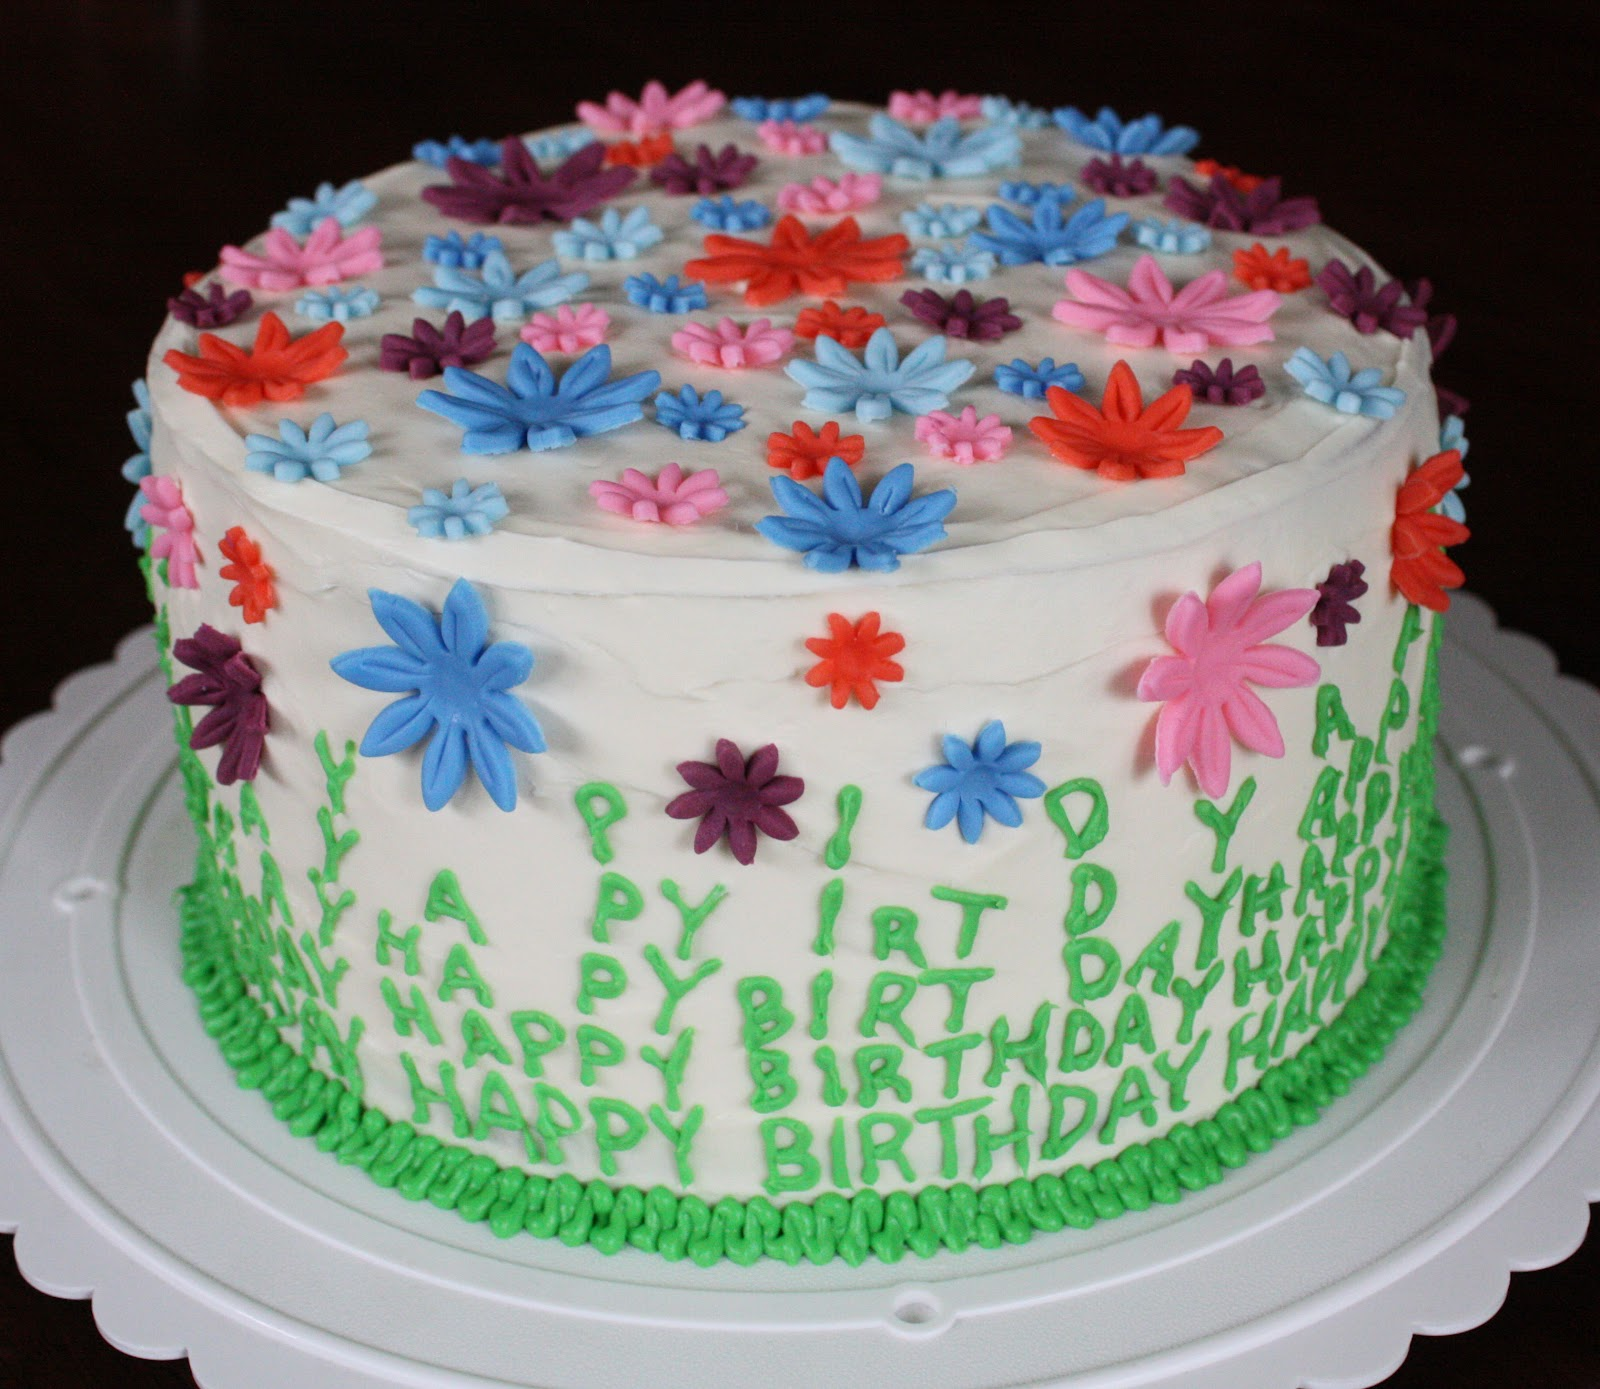 Straight To Cake: Mom's Spring Birthday Cake